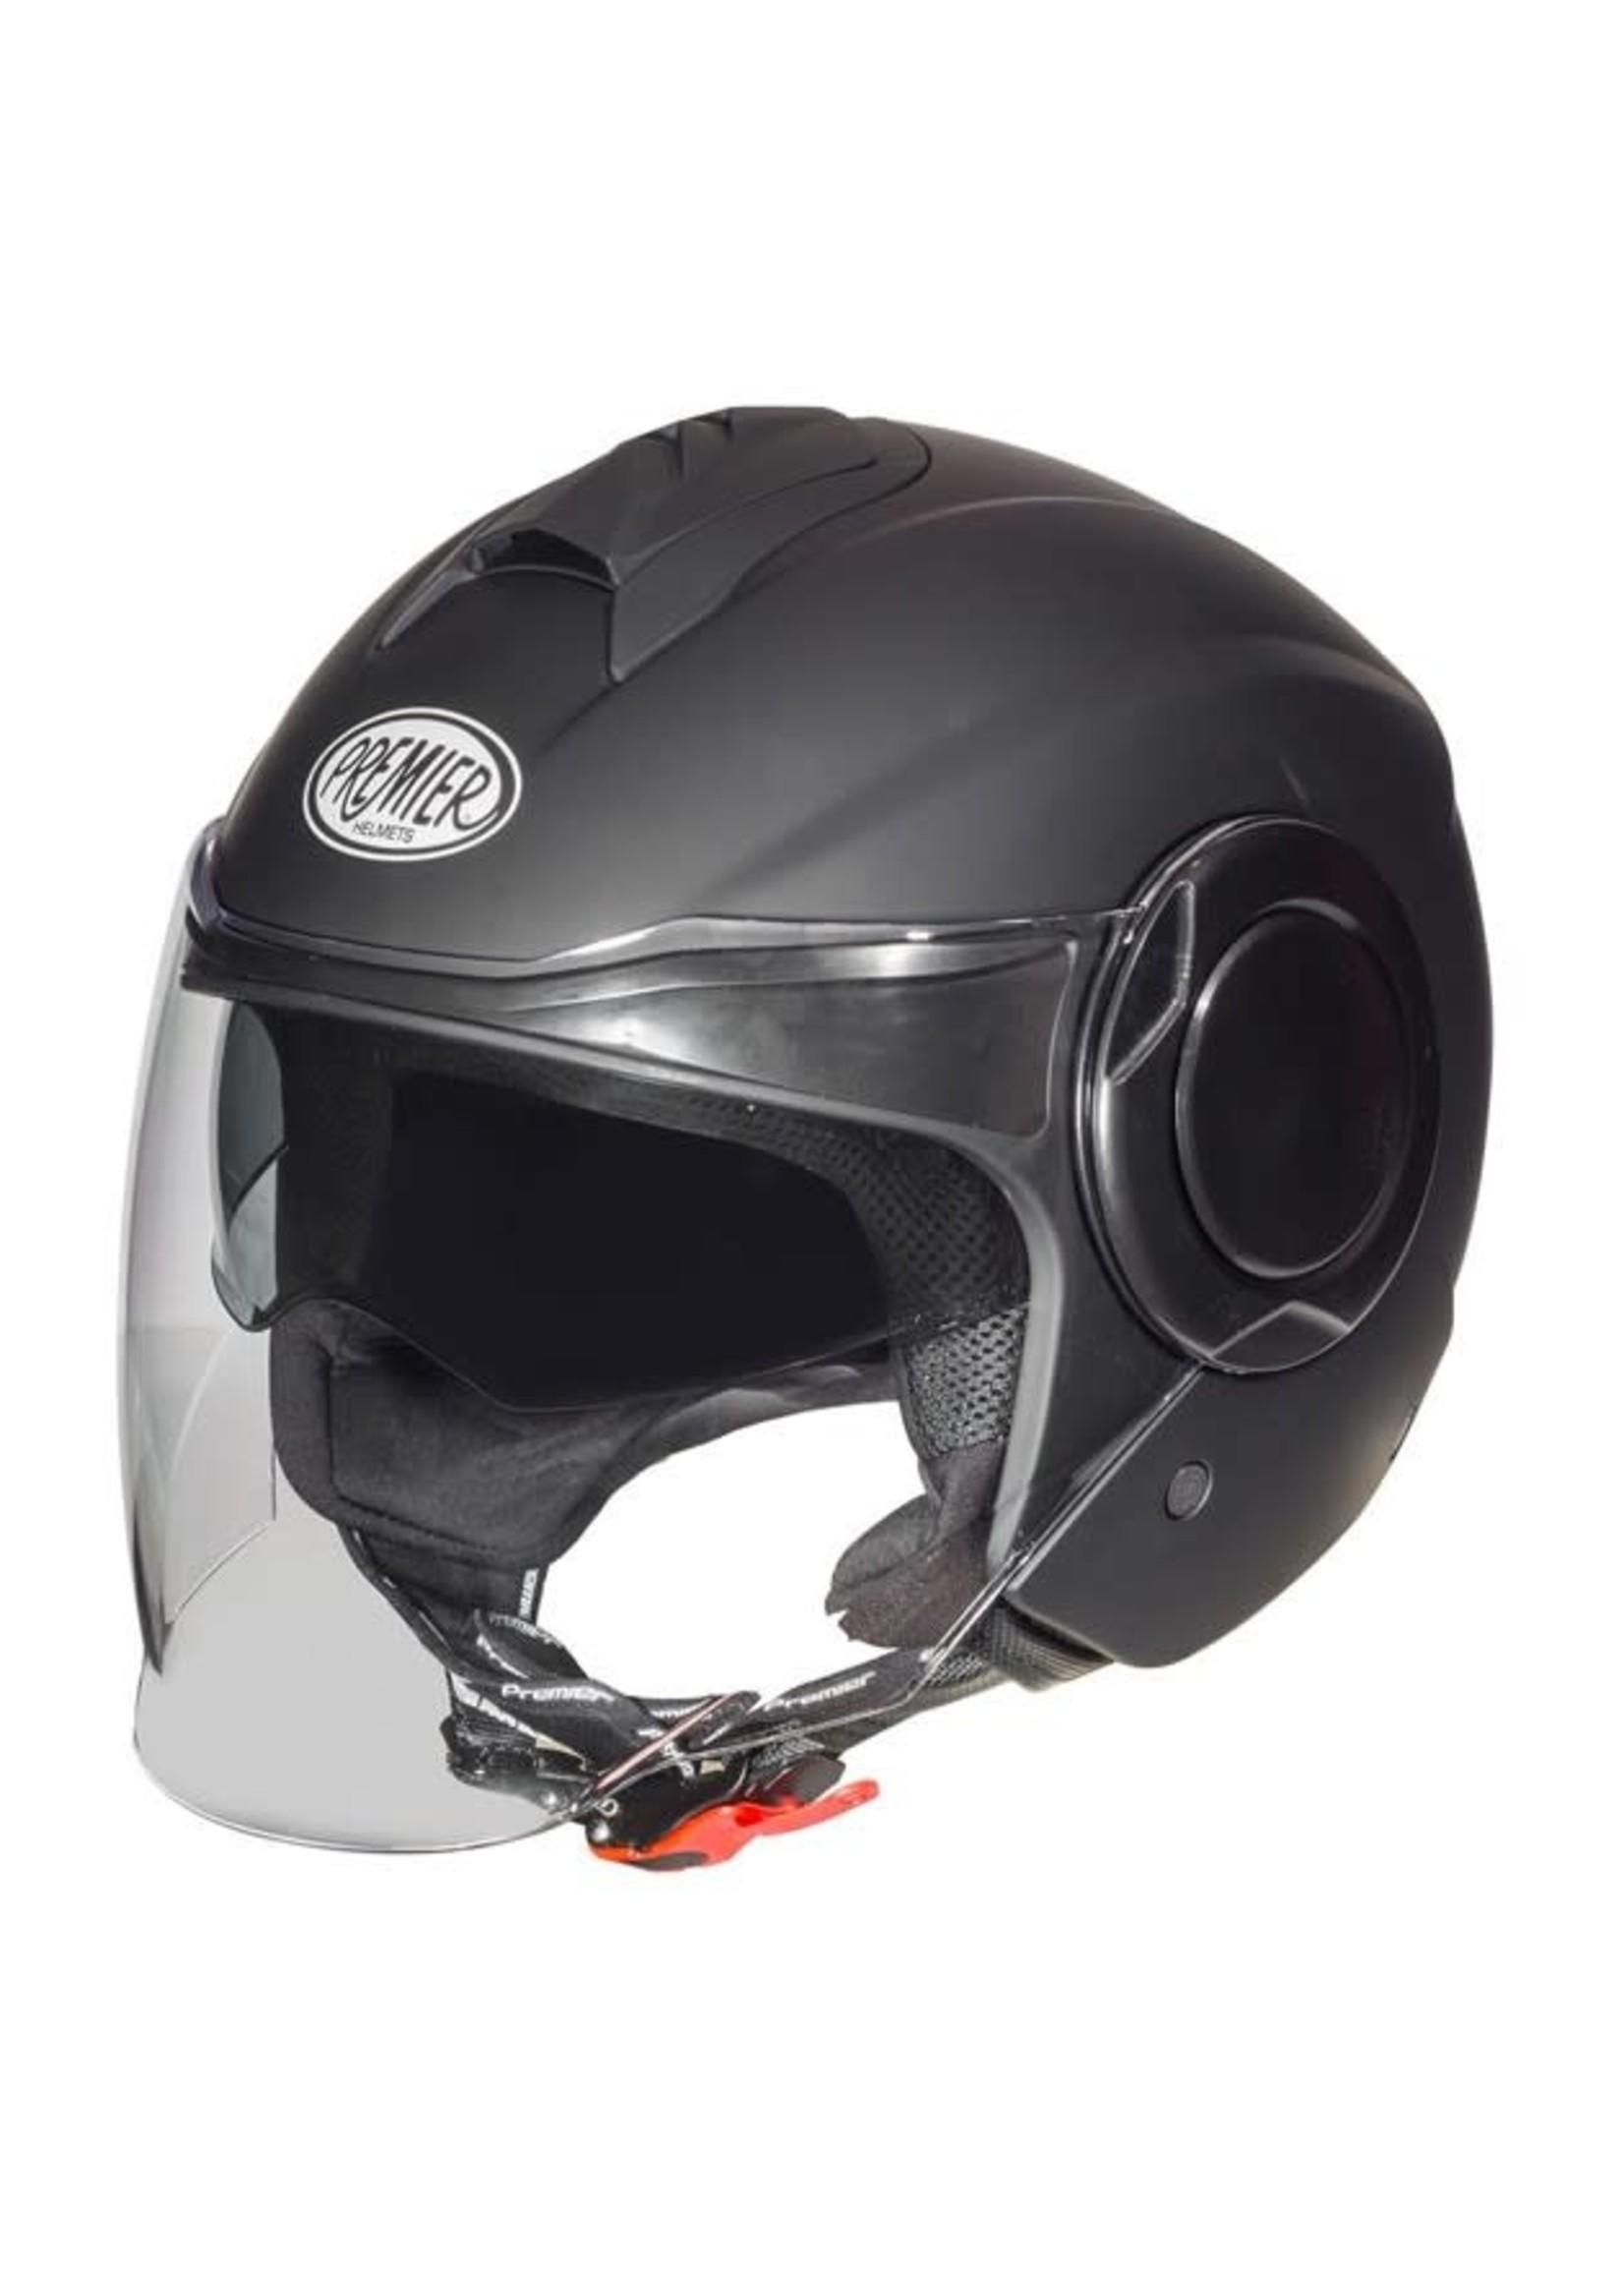 Premier Premier COOL Helm U9 BM